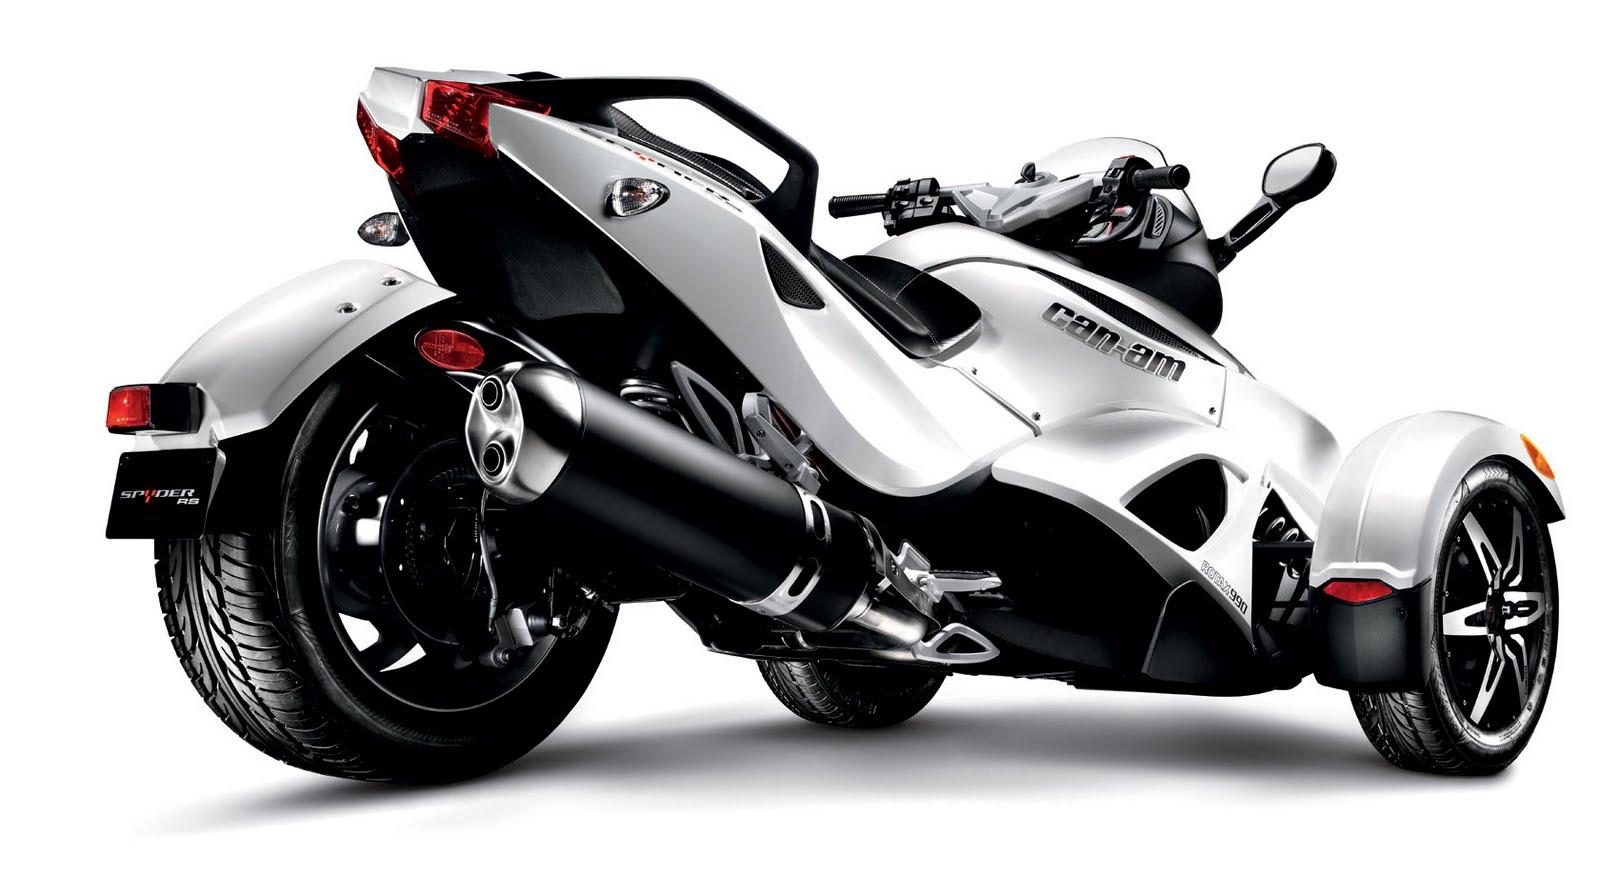 all motorcycle pictures 2009 can am spyder roadster se5. Black Bedroom Furniture Sets. Home Design Ideas